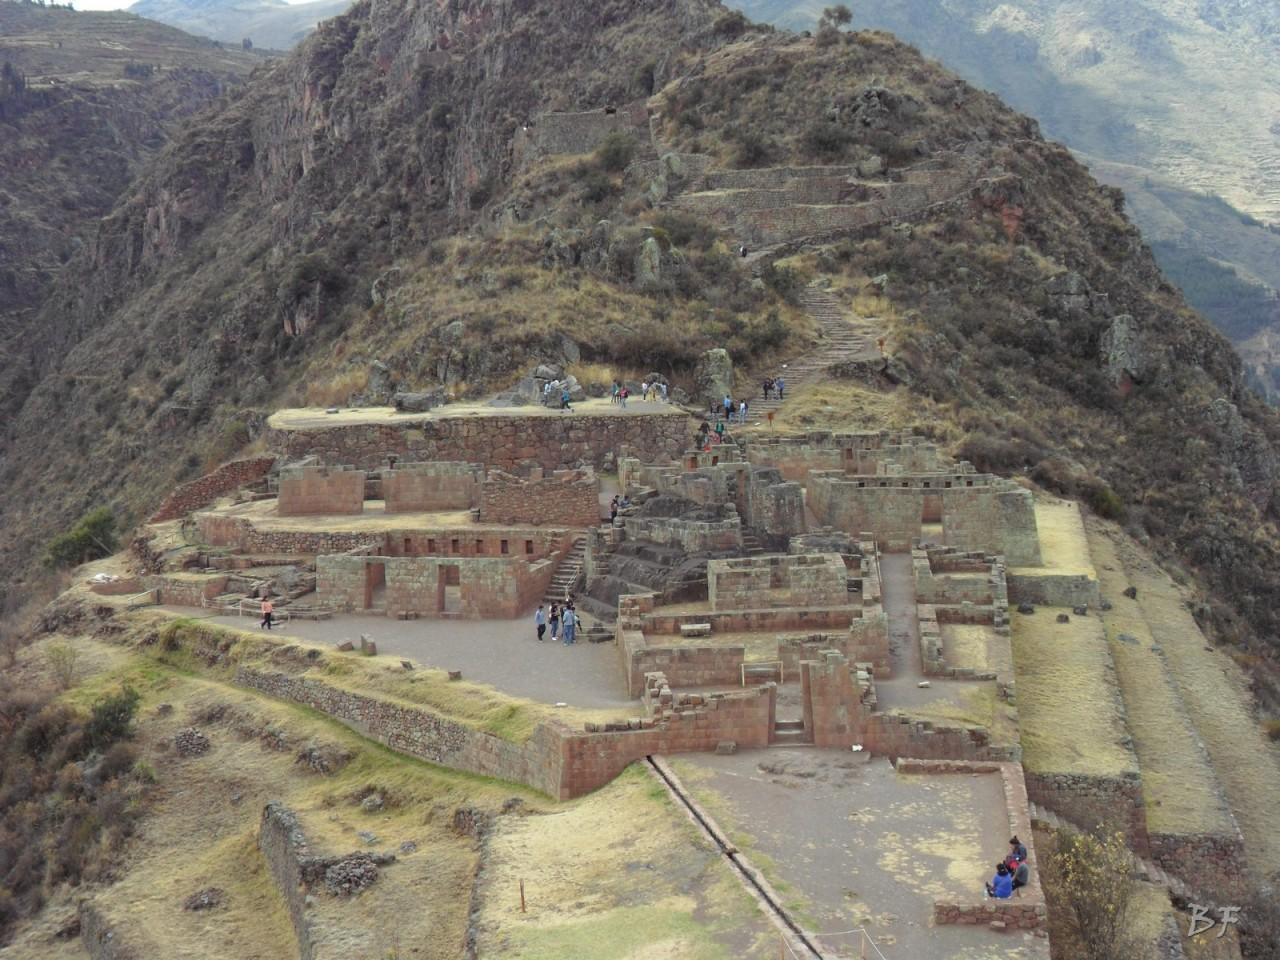 Mura-Poligonali-Megaliti-Altari-Rupestri-Pisac-Cusco-Perù-77